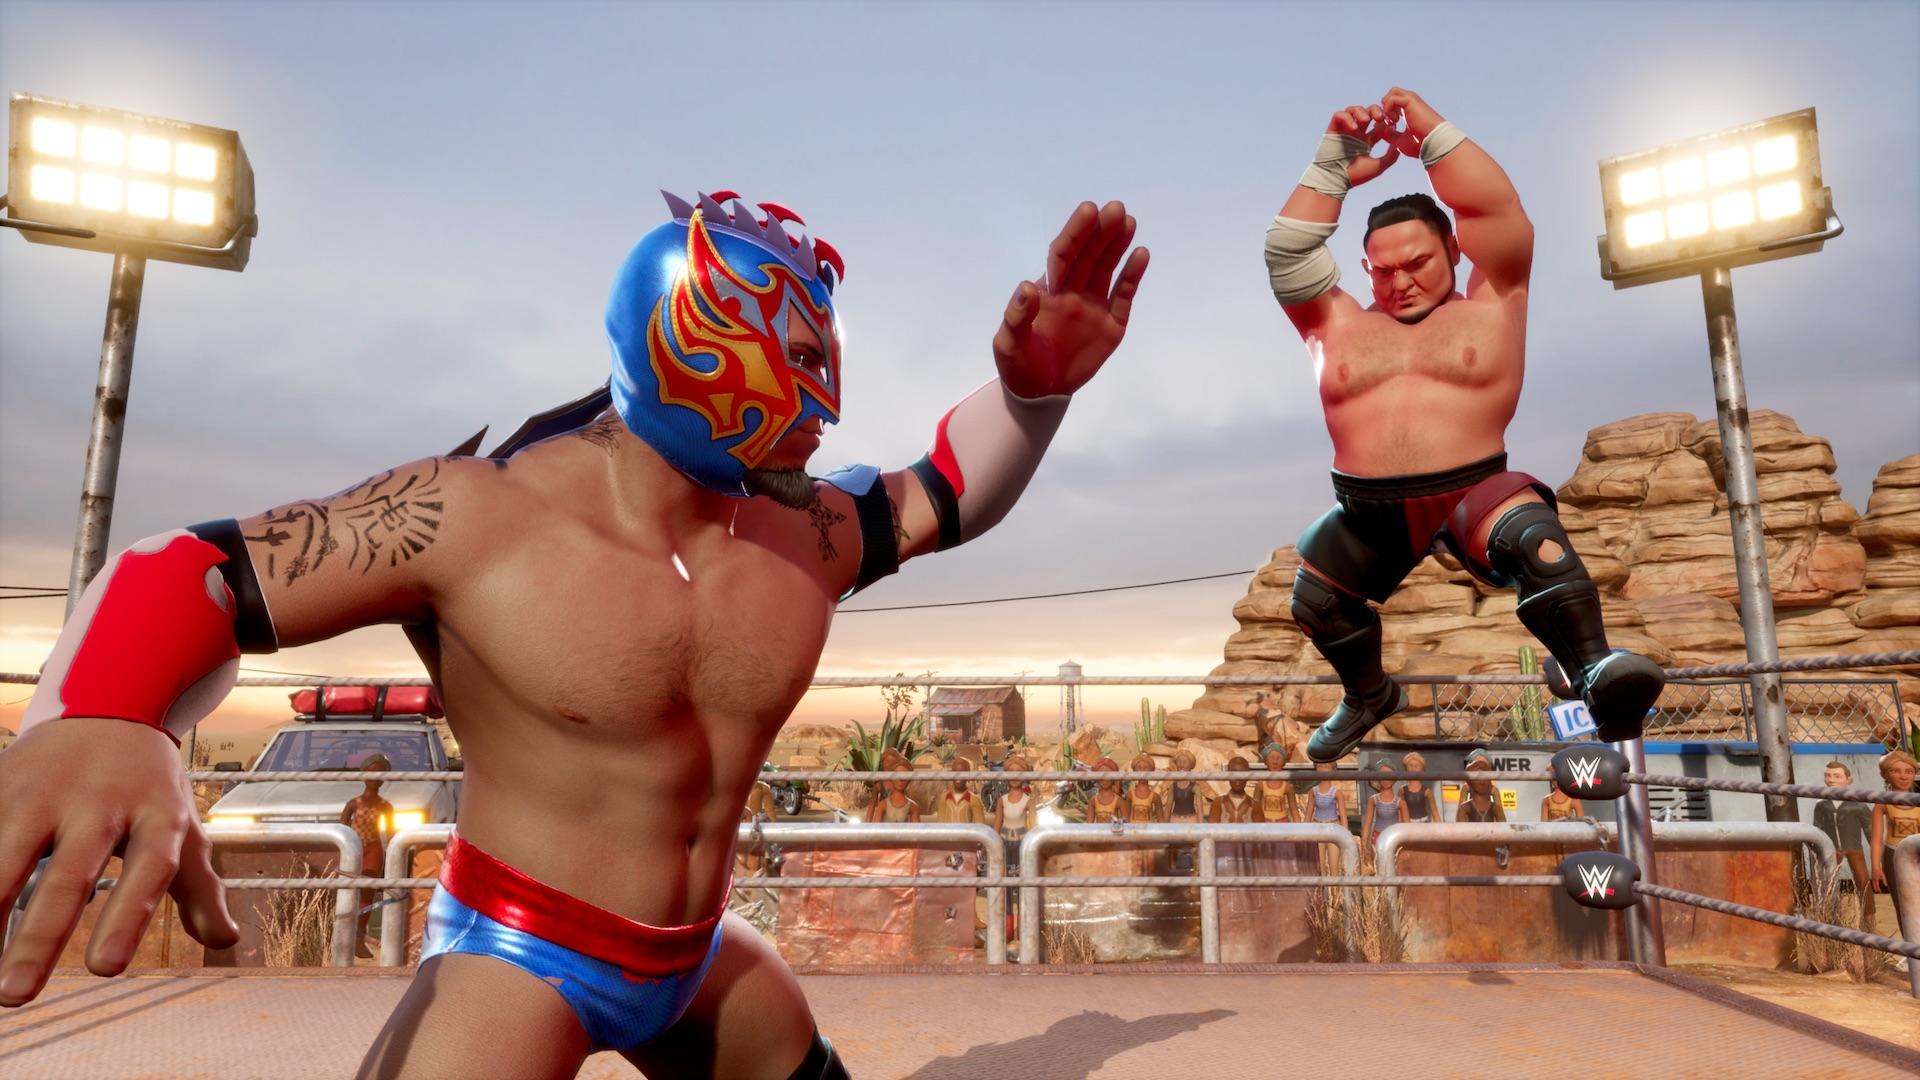 Here's a New WWE 2K Battlegrounds Gameplay Trailer from #NintendoDirect |  PushStartPlay